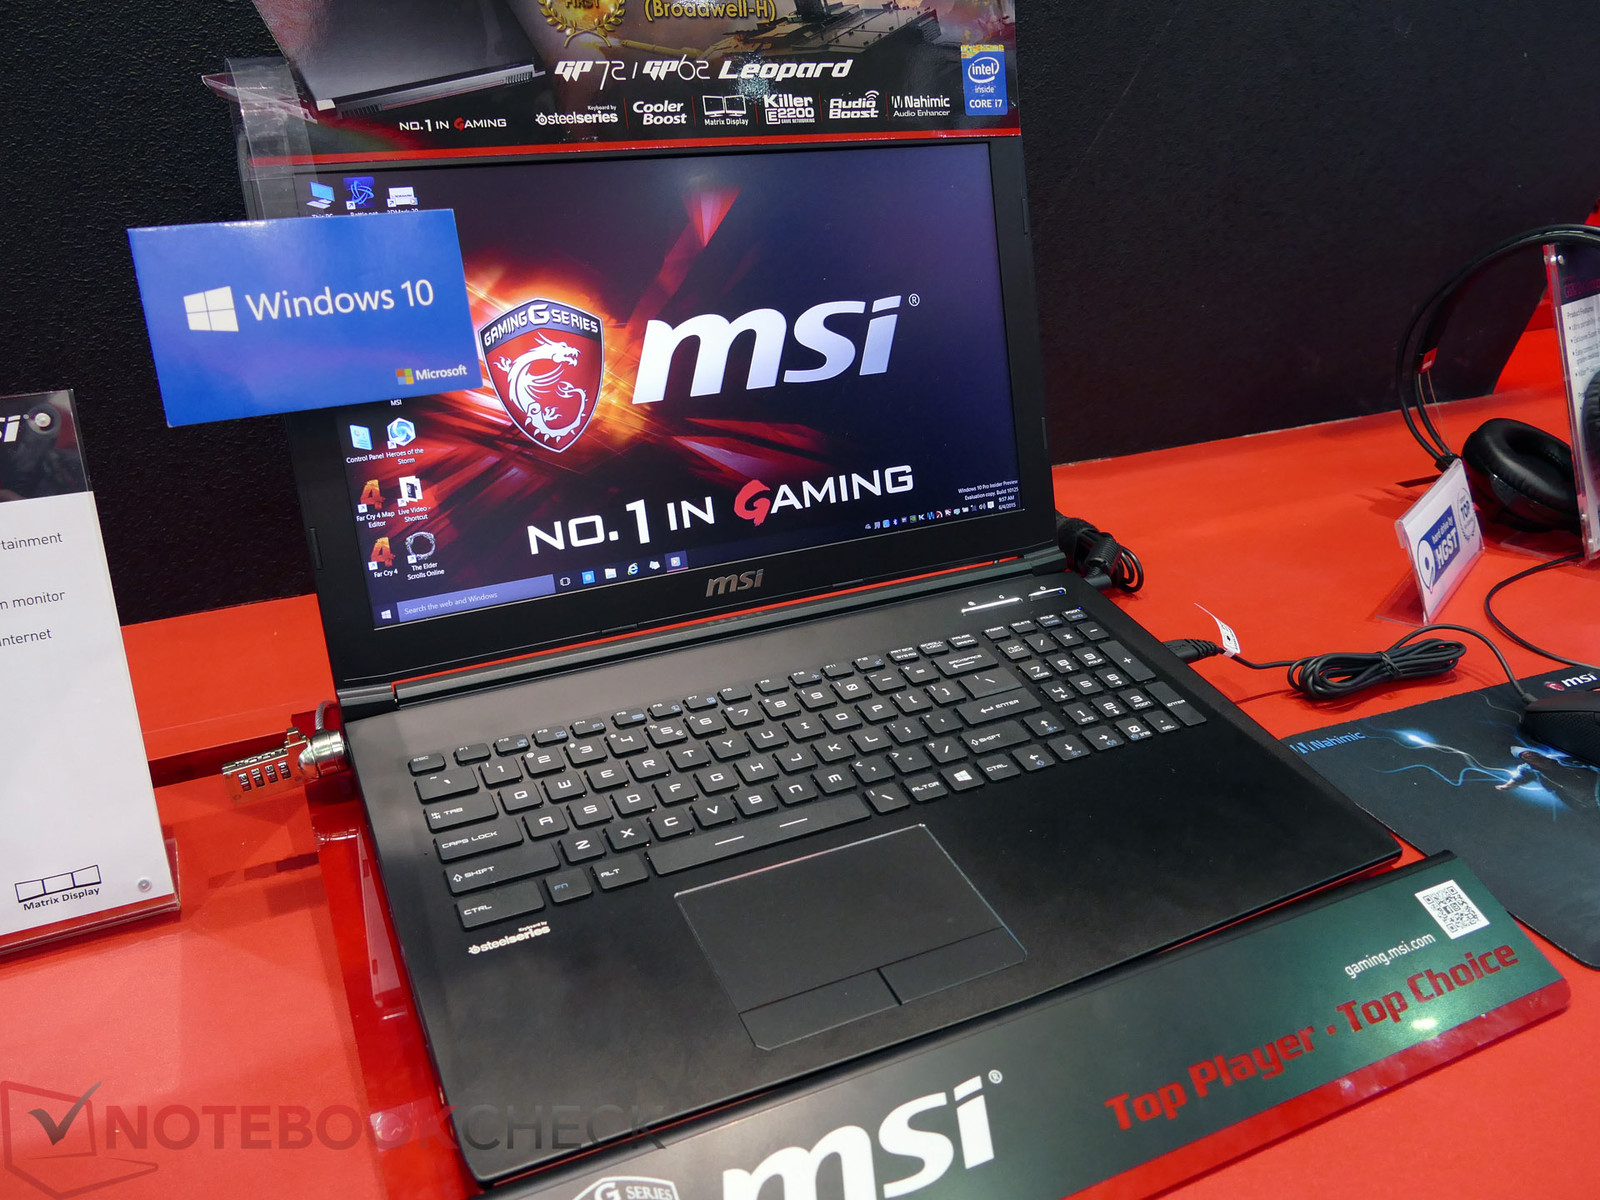 MSI GP62 mit neuem Design - Notebookcheck.com News